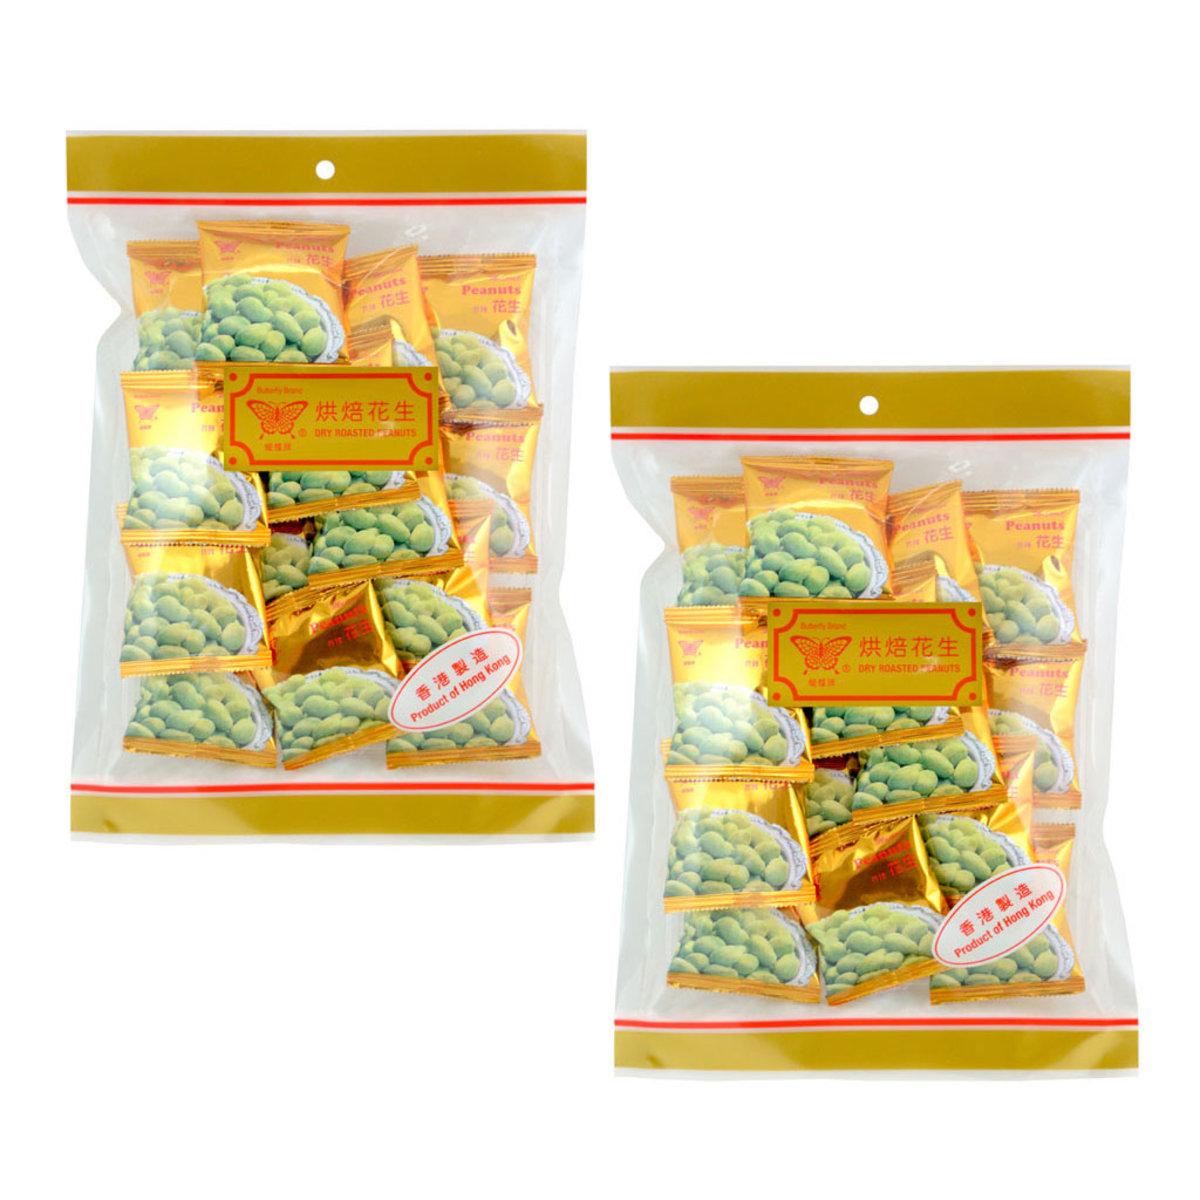 Wasabi Peanuts [2 bags]